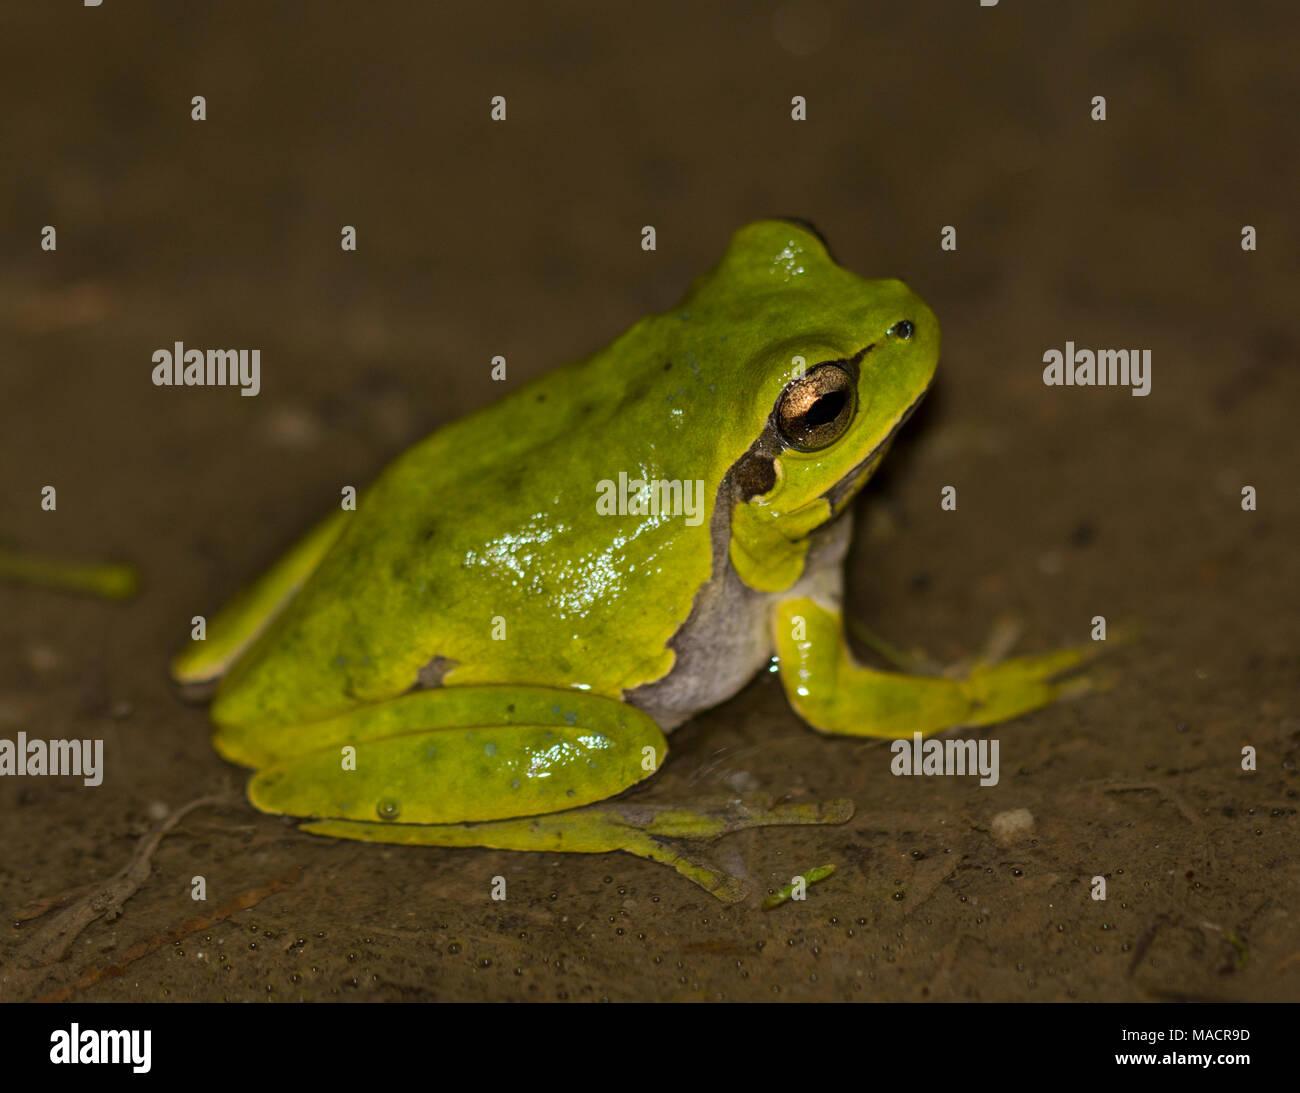 Eastern Tree Frog (Hyla orientalis) Dodecanese island of Kos Greece - Stock Image